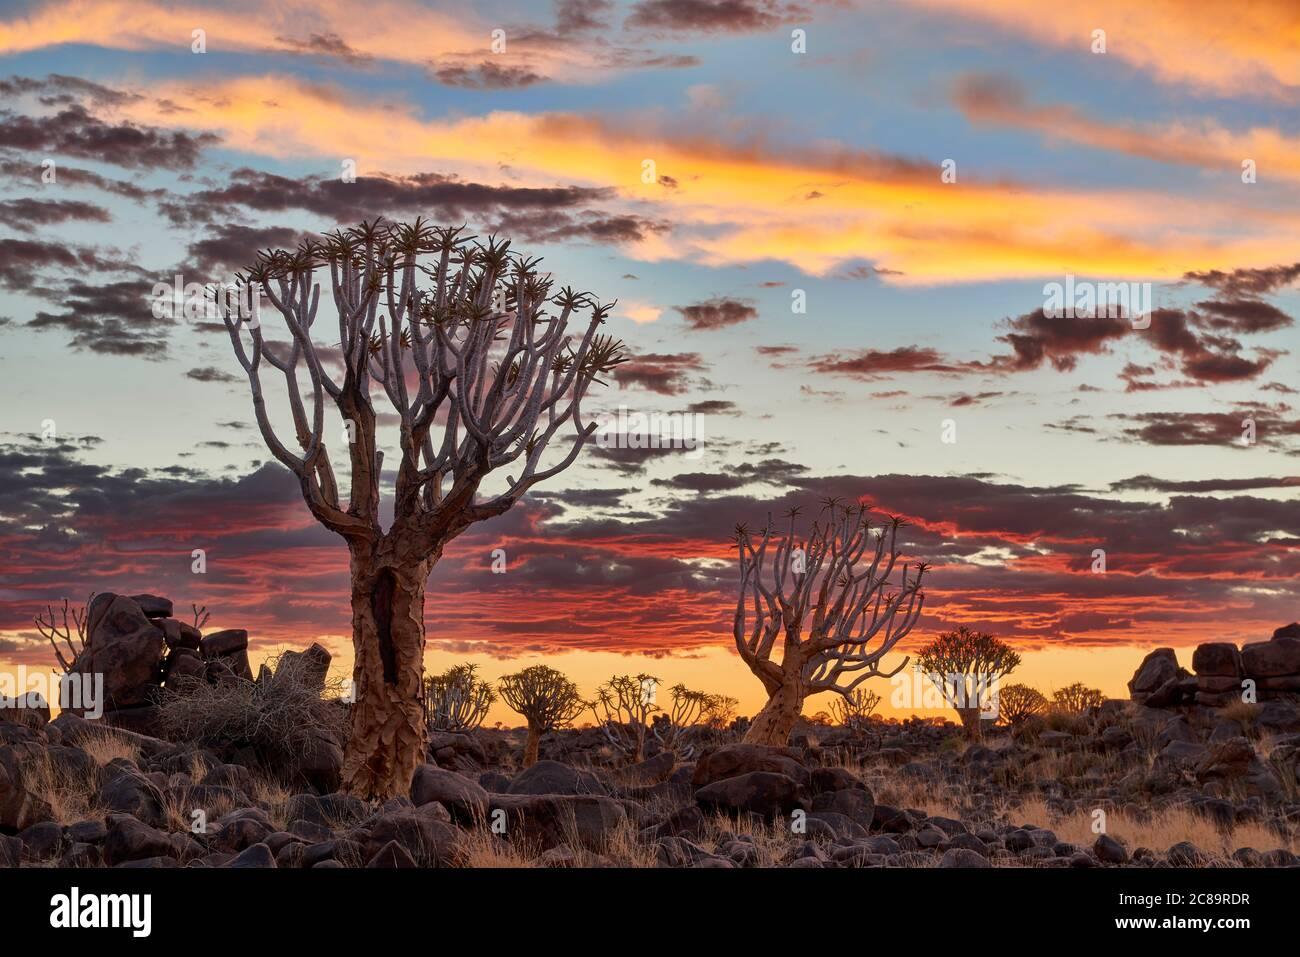 sun set at Quiver tree forest, Aloe dichotoma, Farm Garas, Mesosaurus Fossil Site, Keetmanshoop, Namibia, Africa Stock Photo